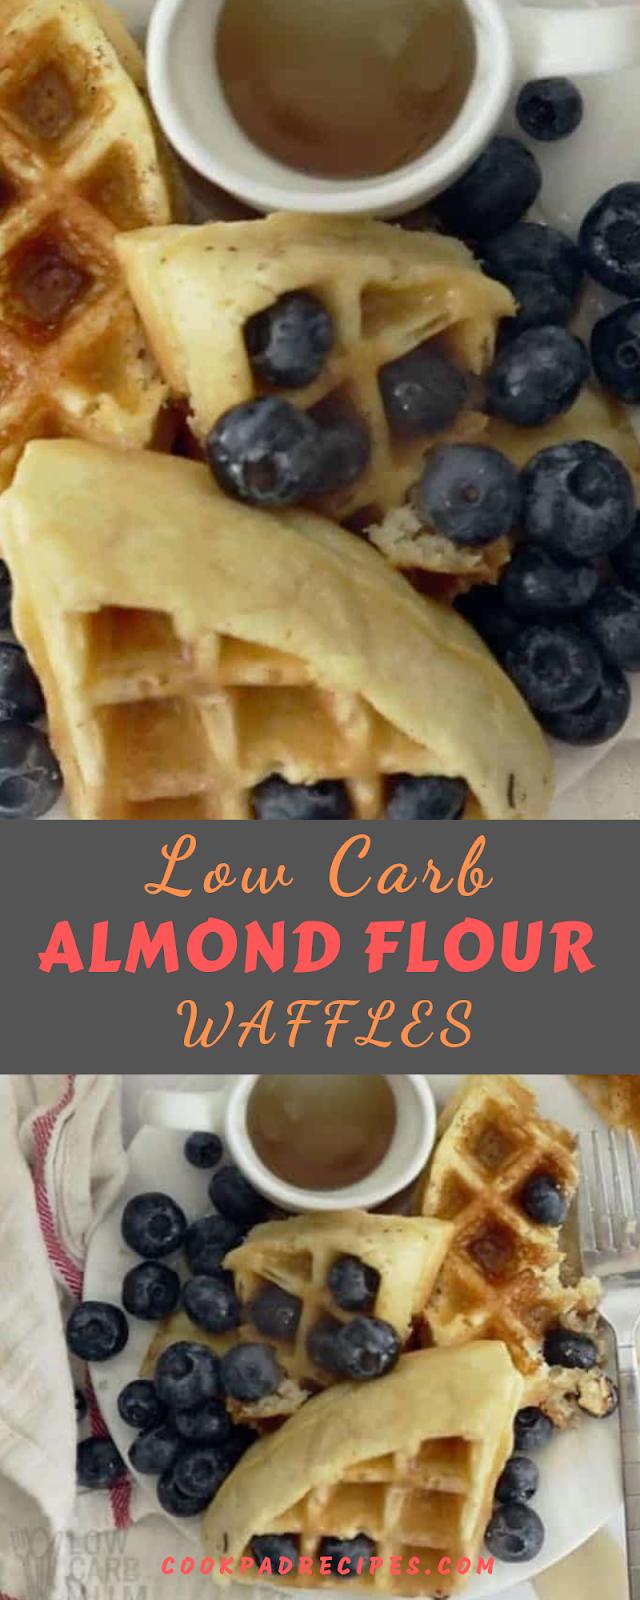 Low Carb Almond Flour Waffles – Gluten Free